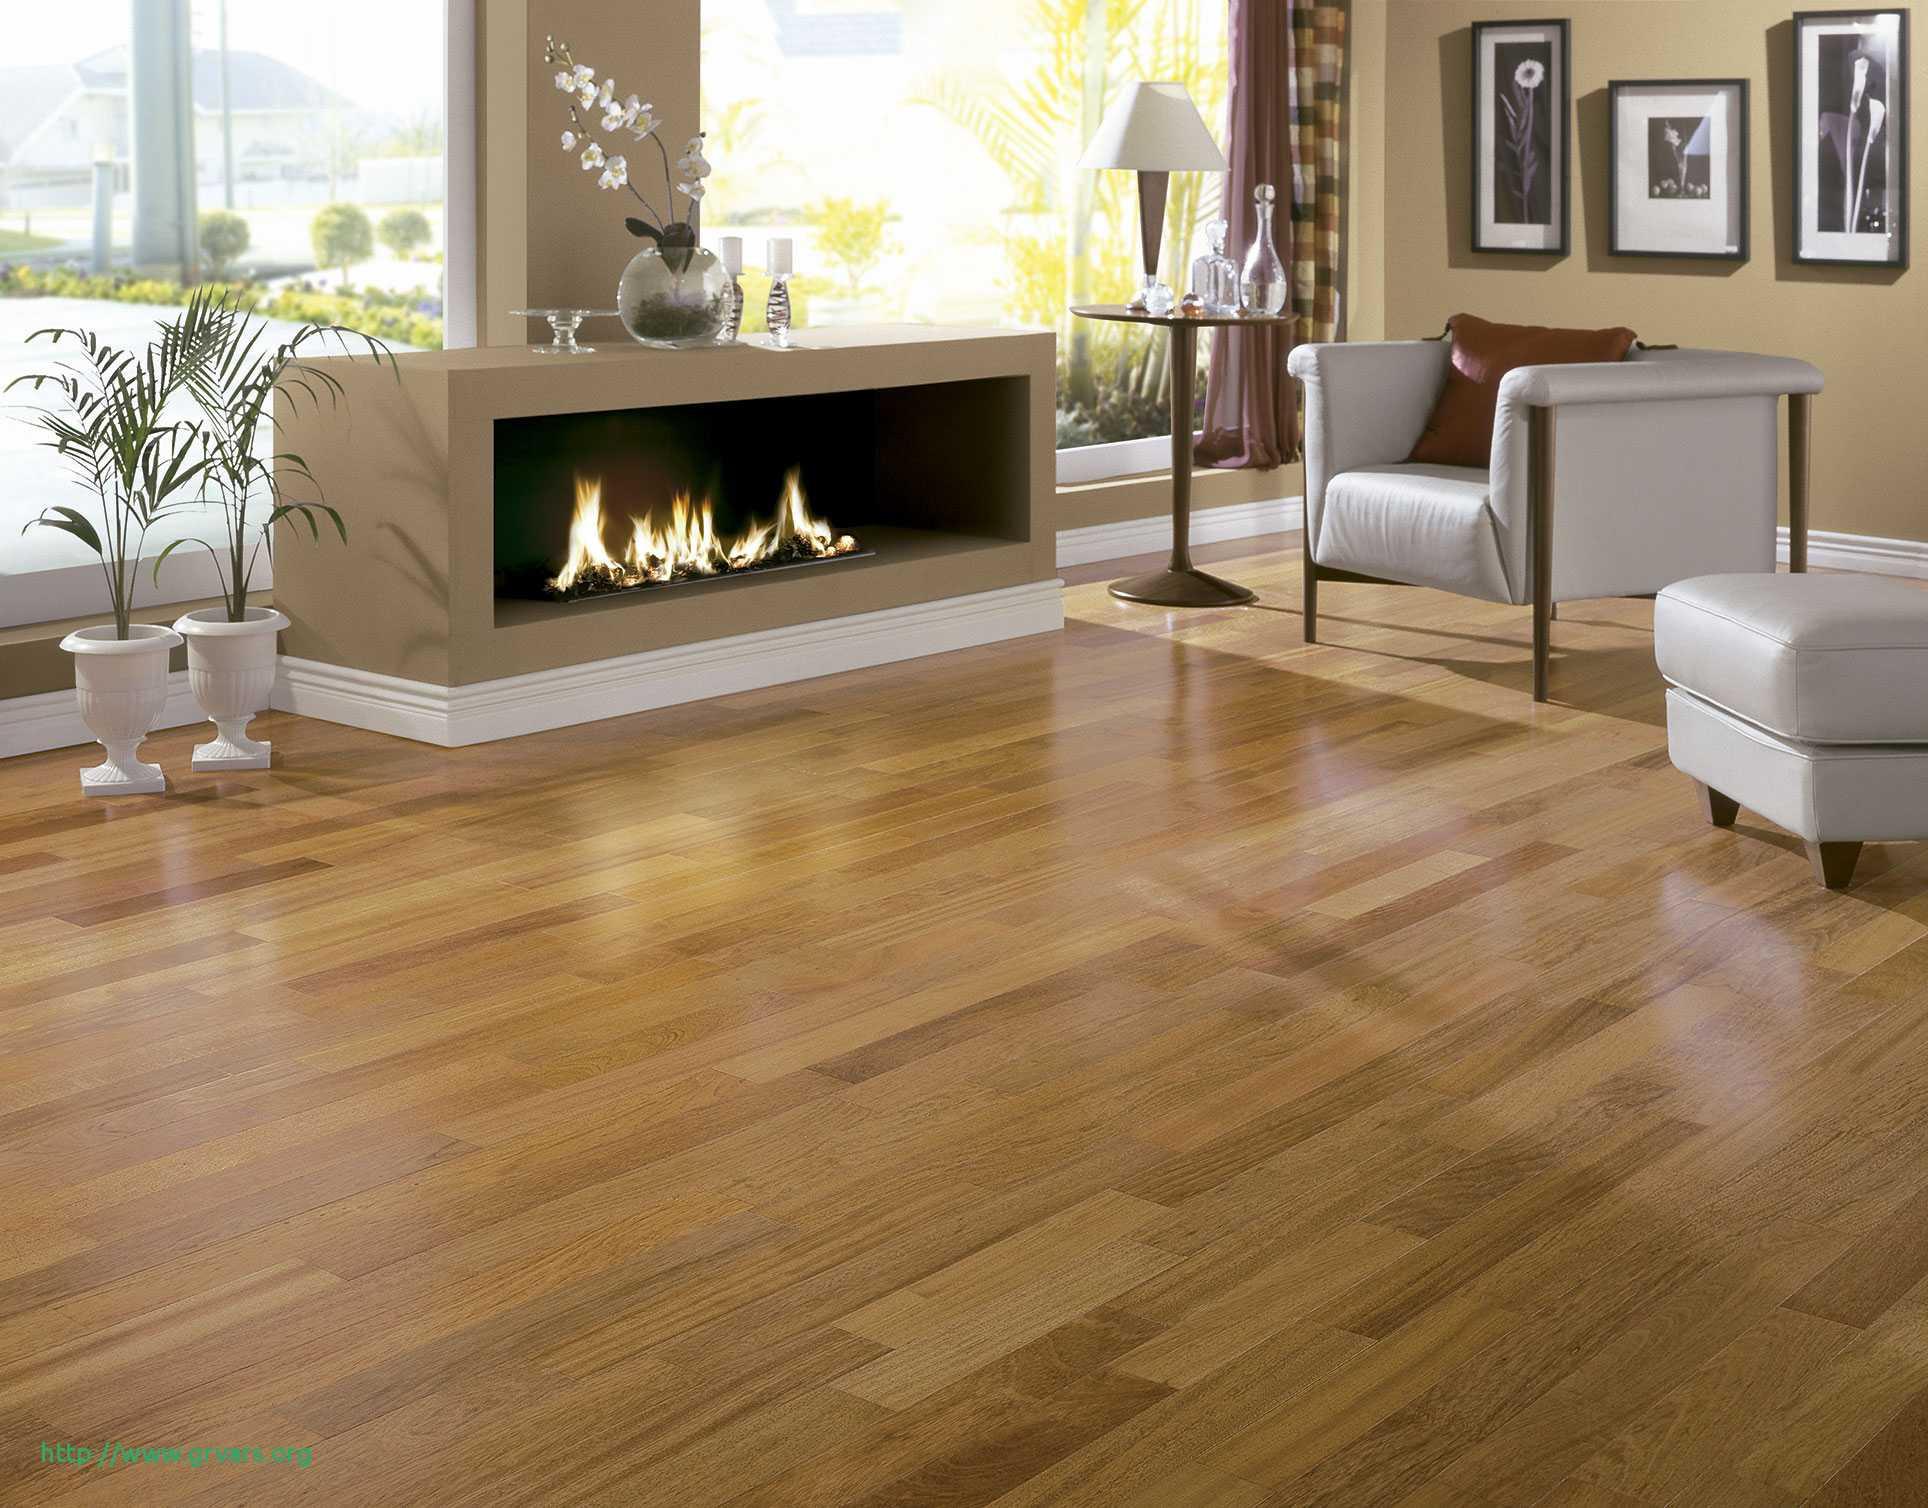 hardwood flooring lengths of 20 unique hardwood floor plank sizes ideas blog pertaining to full size of bedroom cute discount hardwood flooring 6 brazilian cherry 1920x1508 discount hardwood flooring